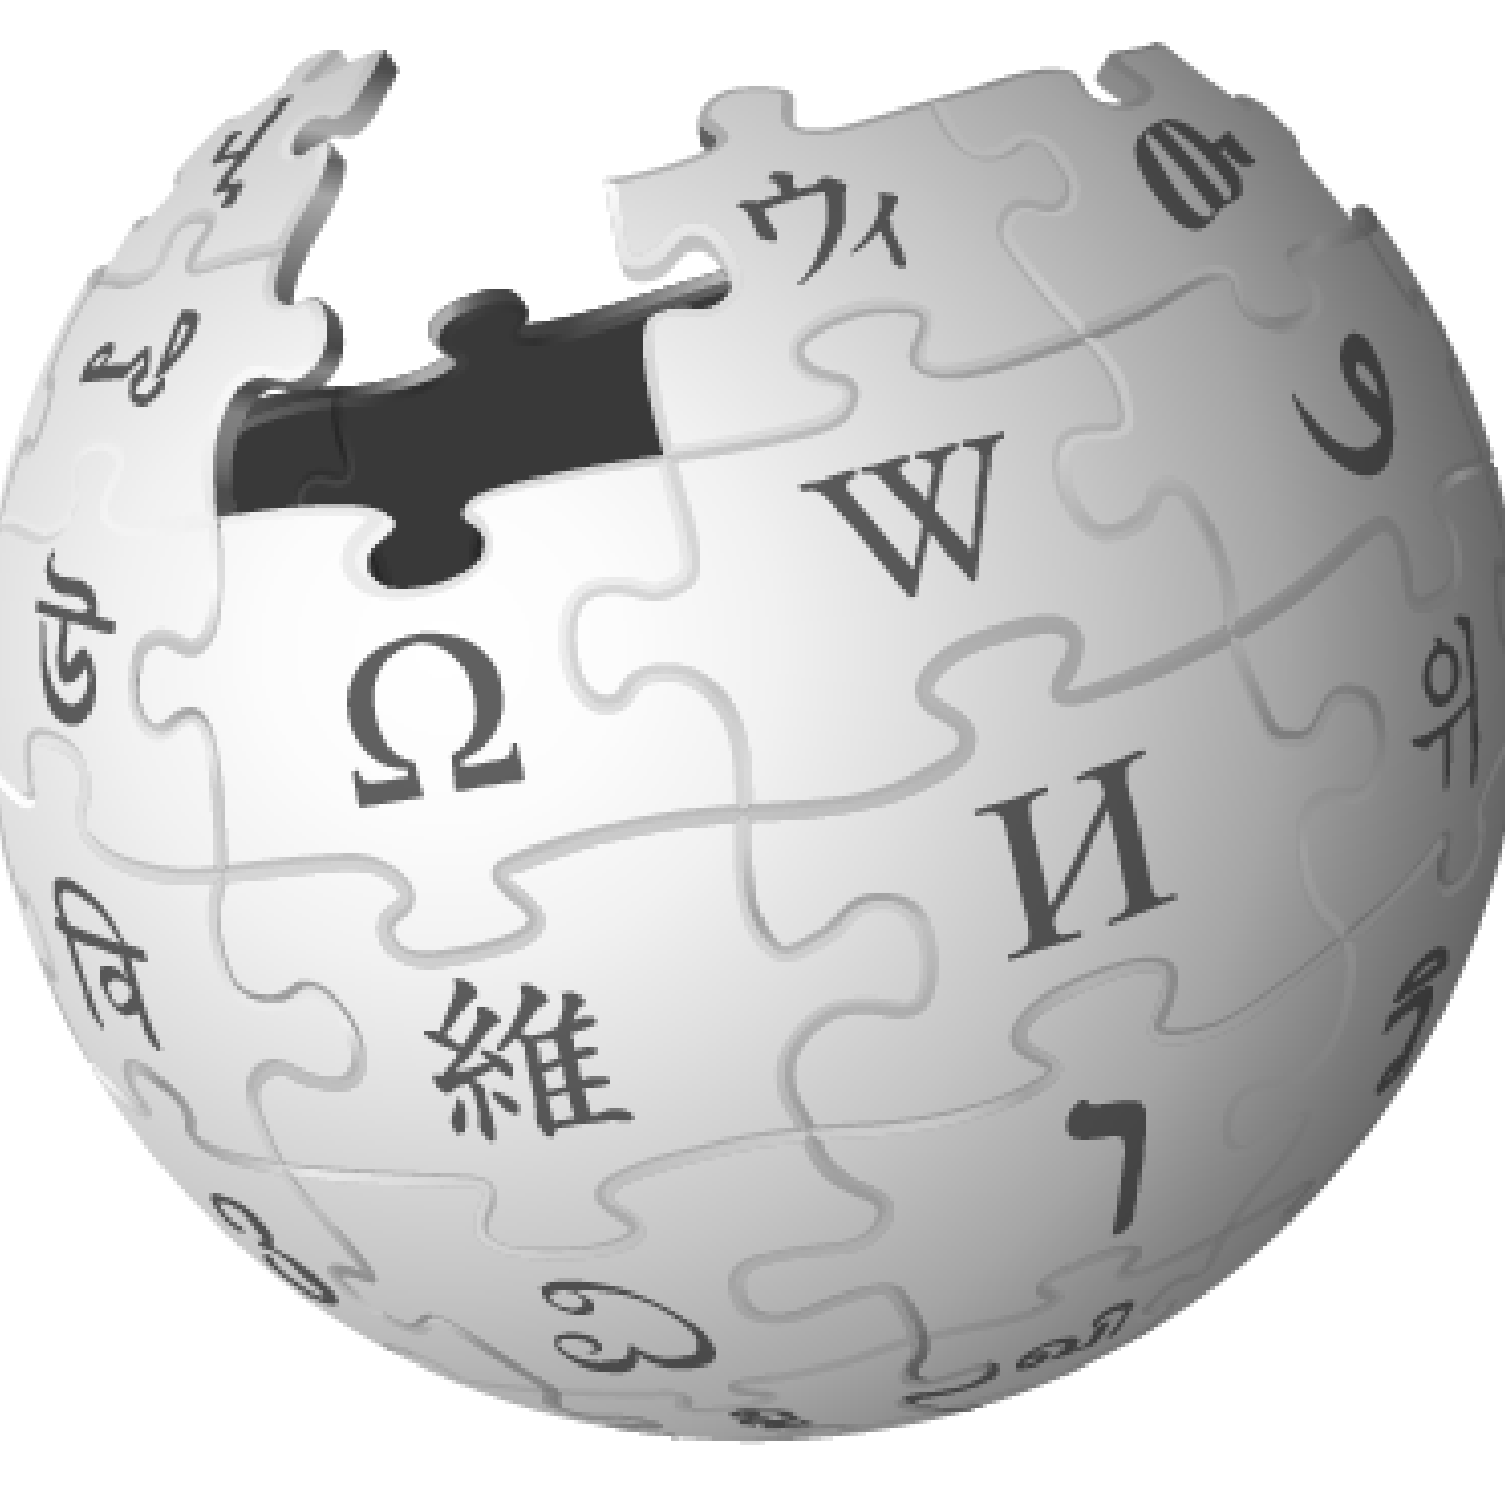 Berlinedu Wiki Edits On Twitter Aston Martin Dbs Wikipedia Article Edited Anonymously By Fu Berlin Http T Co R3hmbypcpn